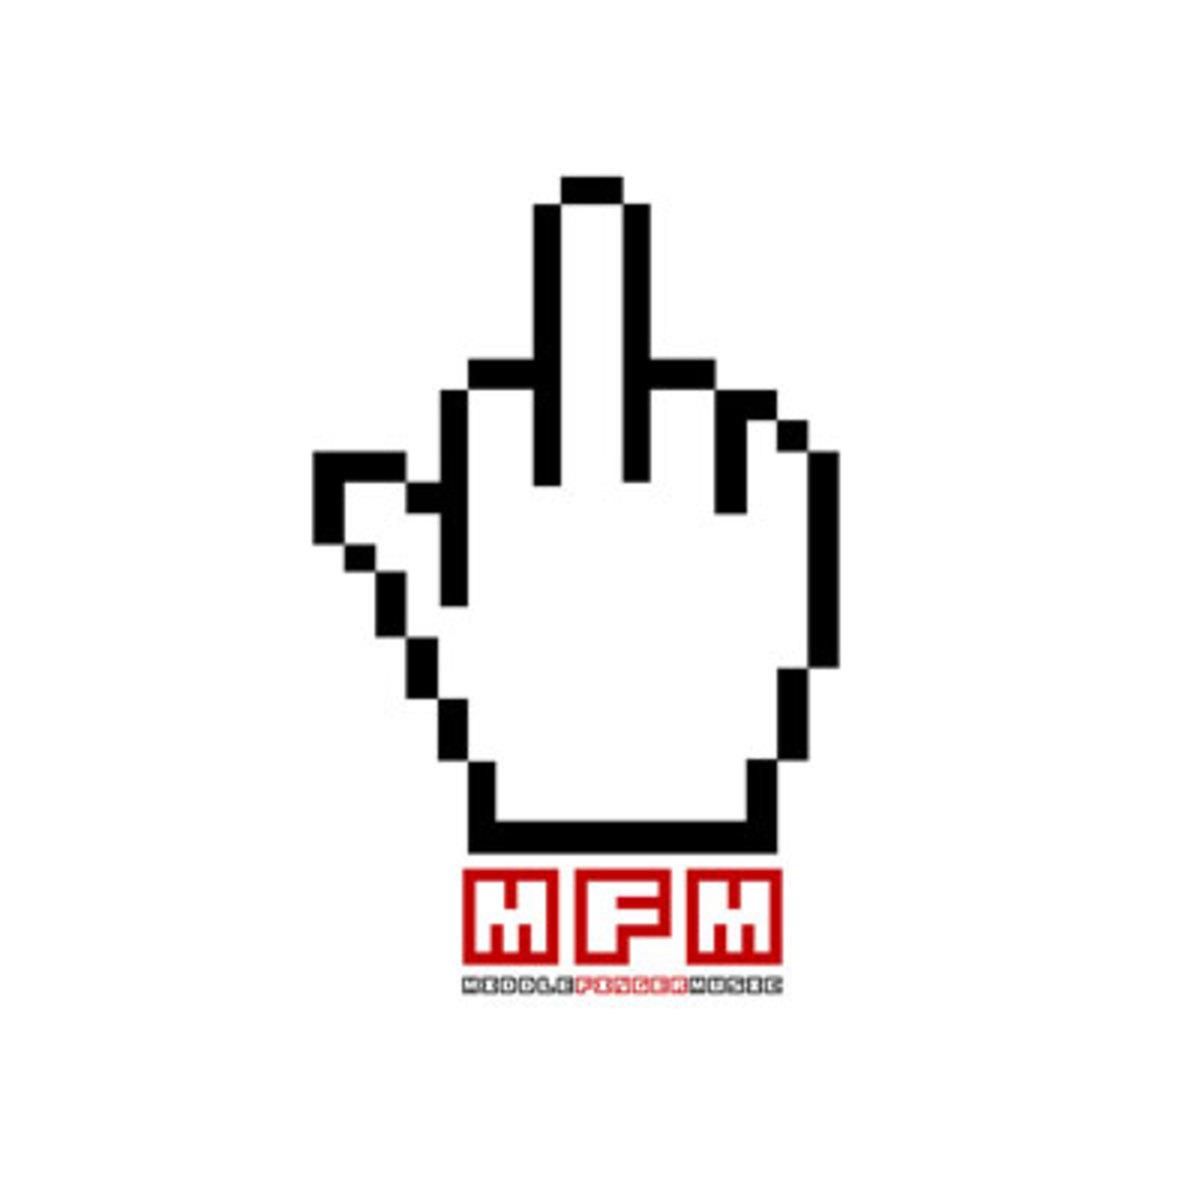 nickpratt-middlefinger.jpg